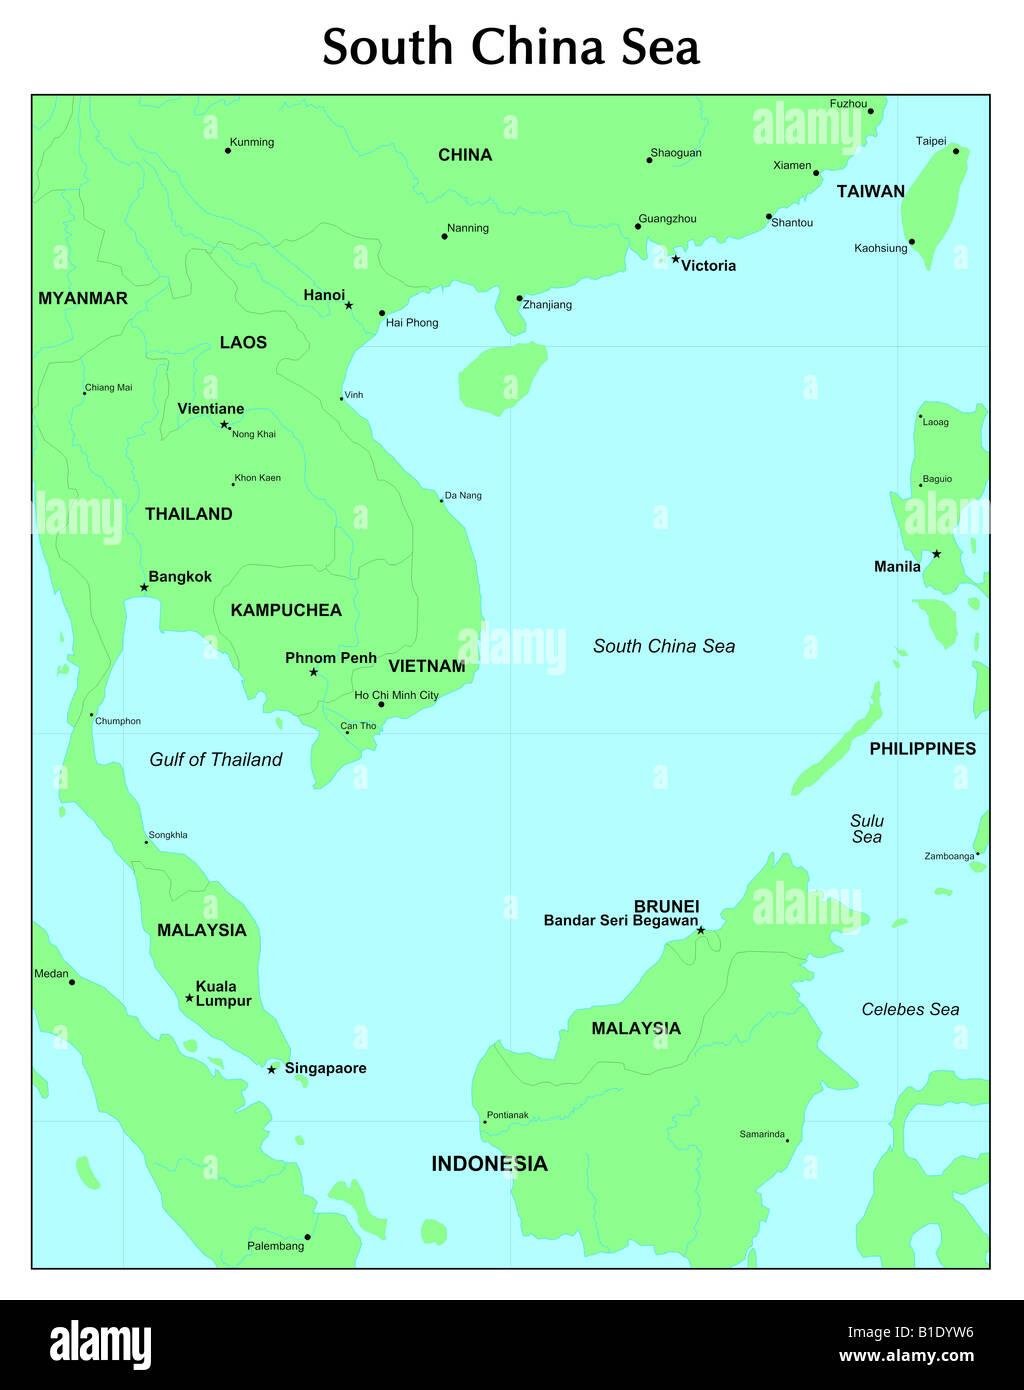 South China Sea - Stock Image